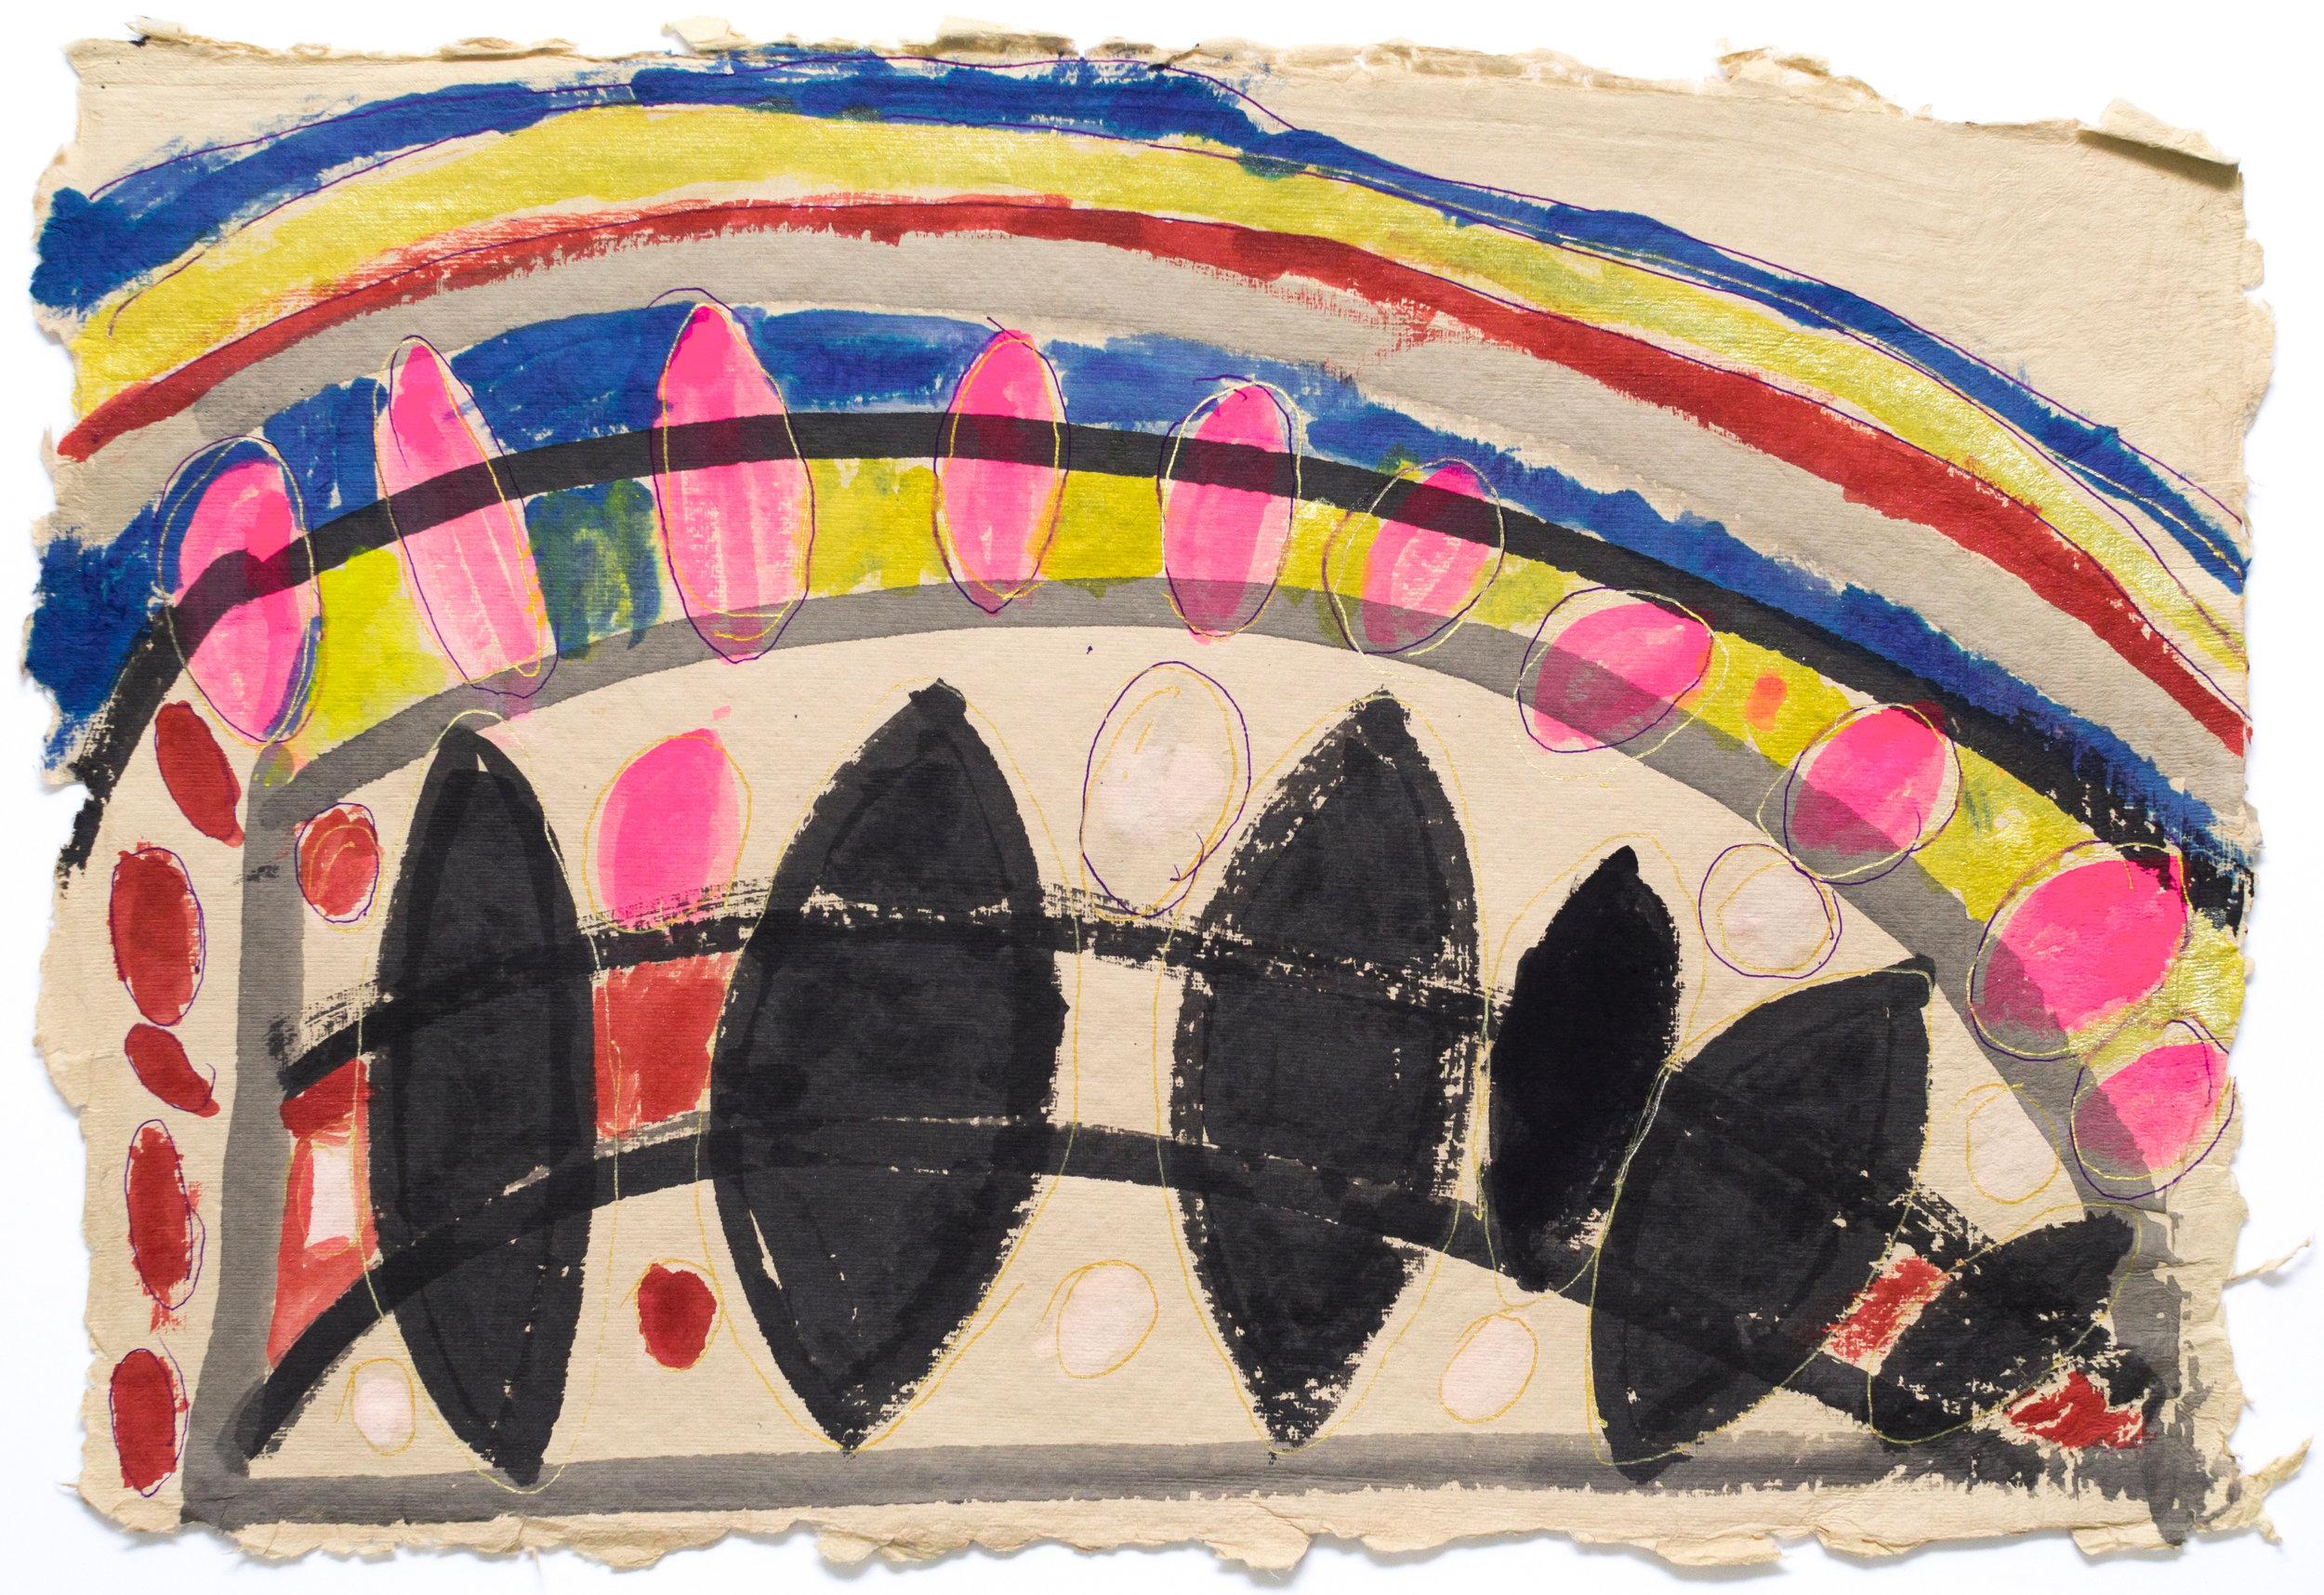 Allan Lofberg, Untitled (ALo 072), 2018, 13 x 19 inches